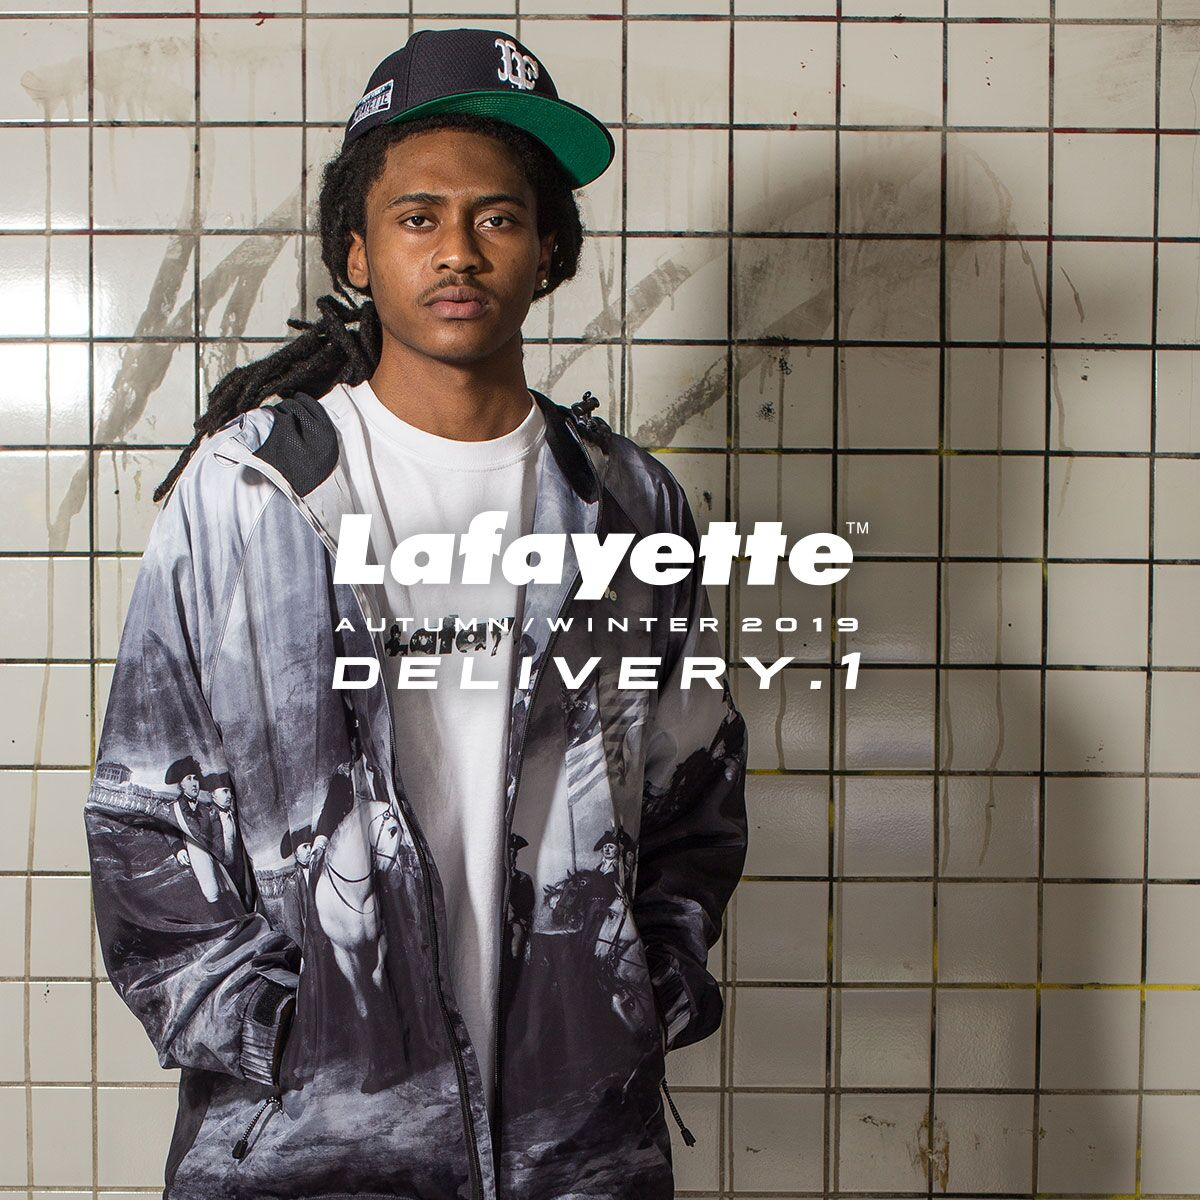 lafayette_2019_aw_1st